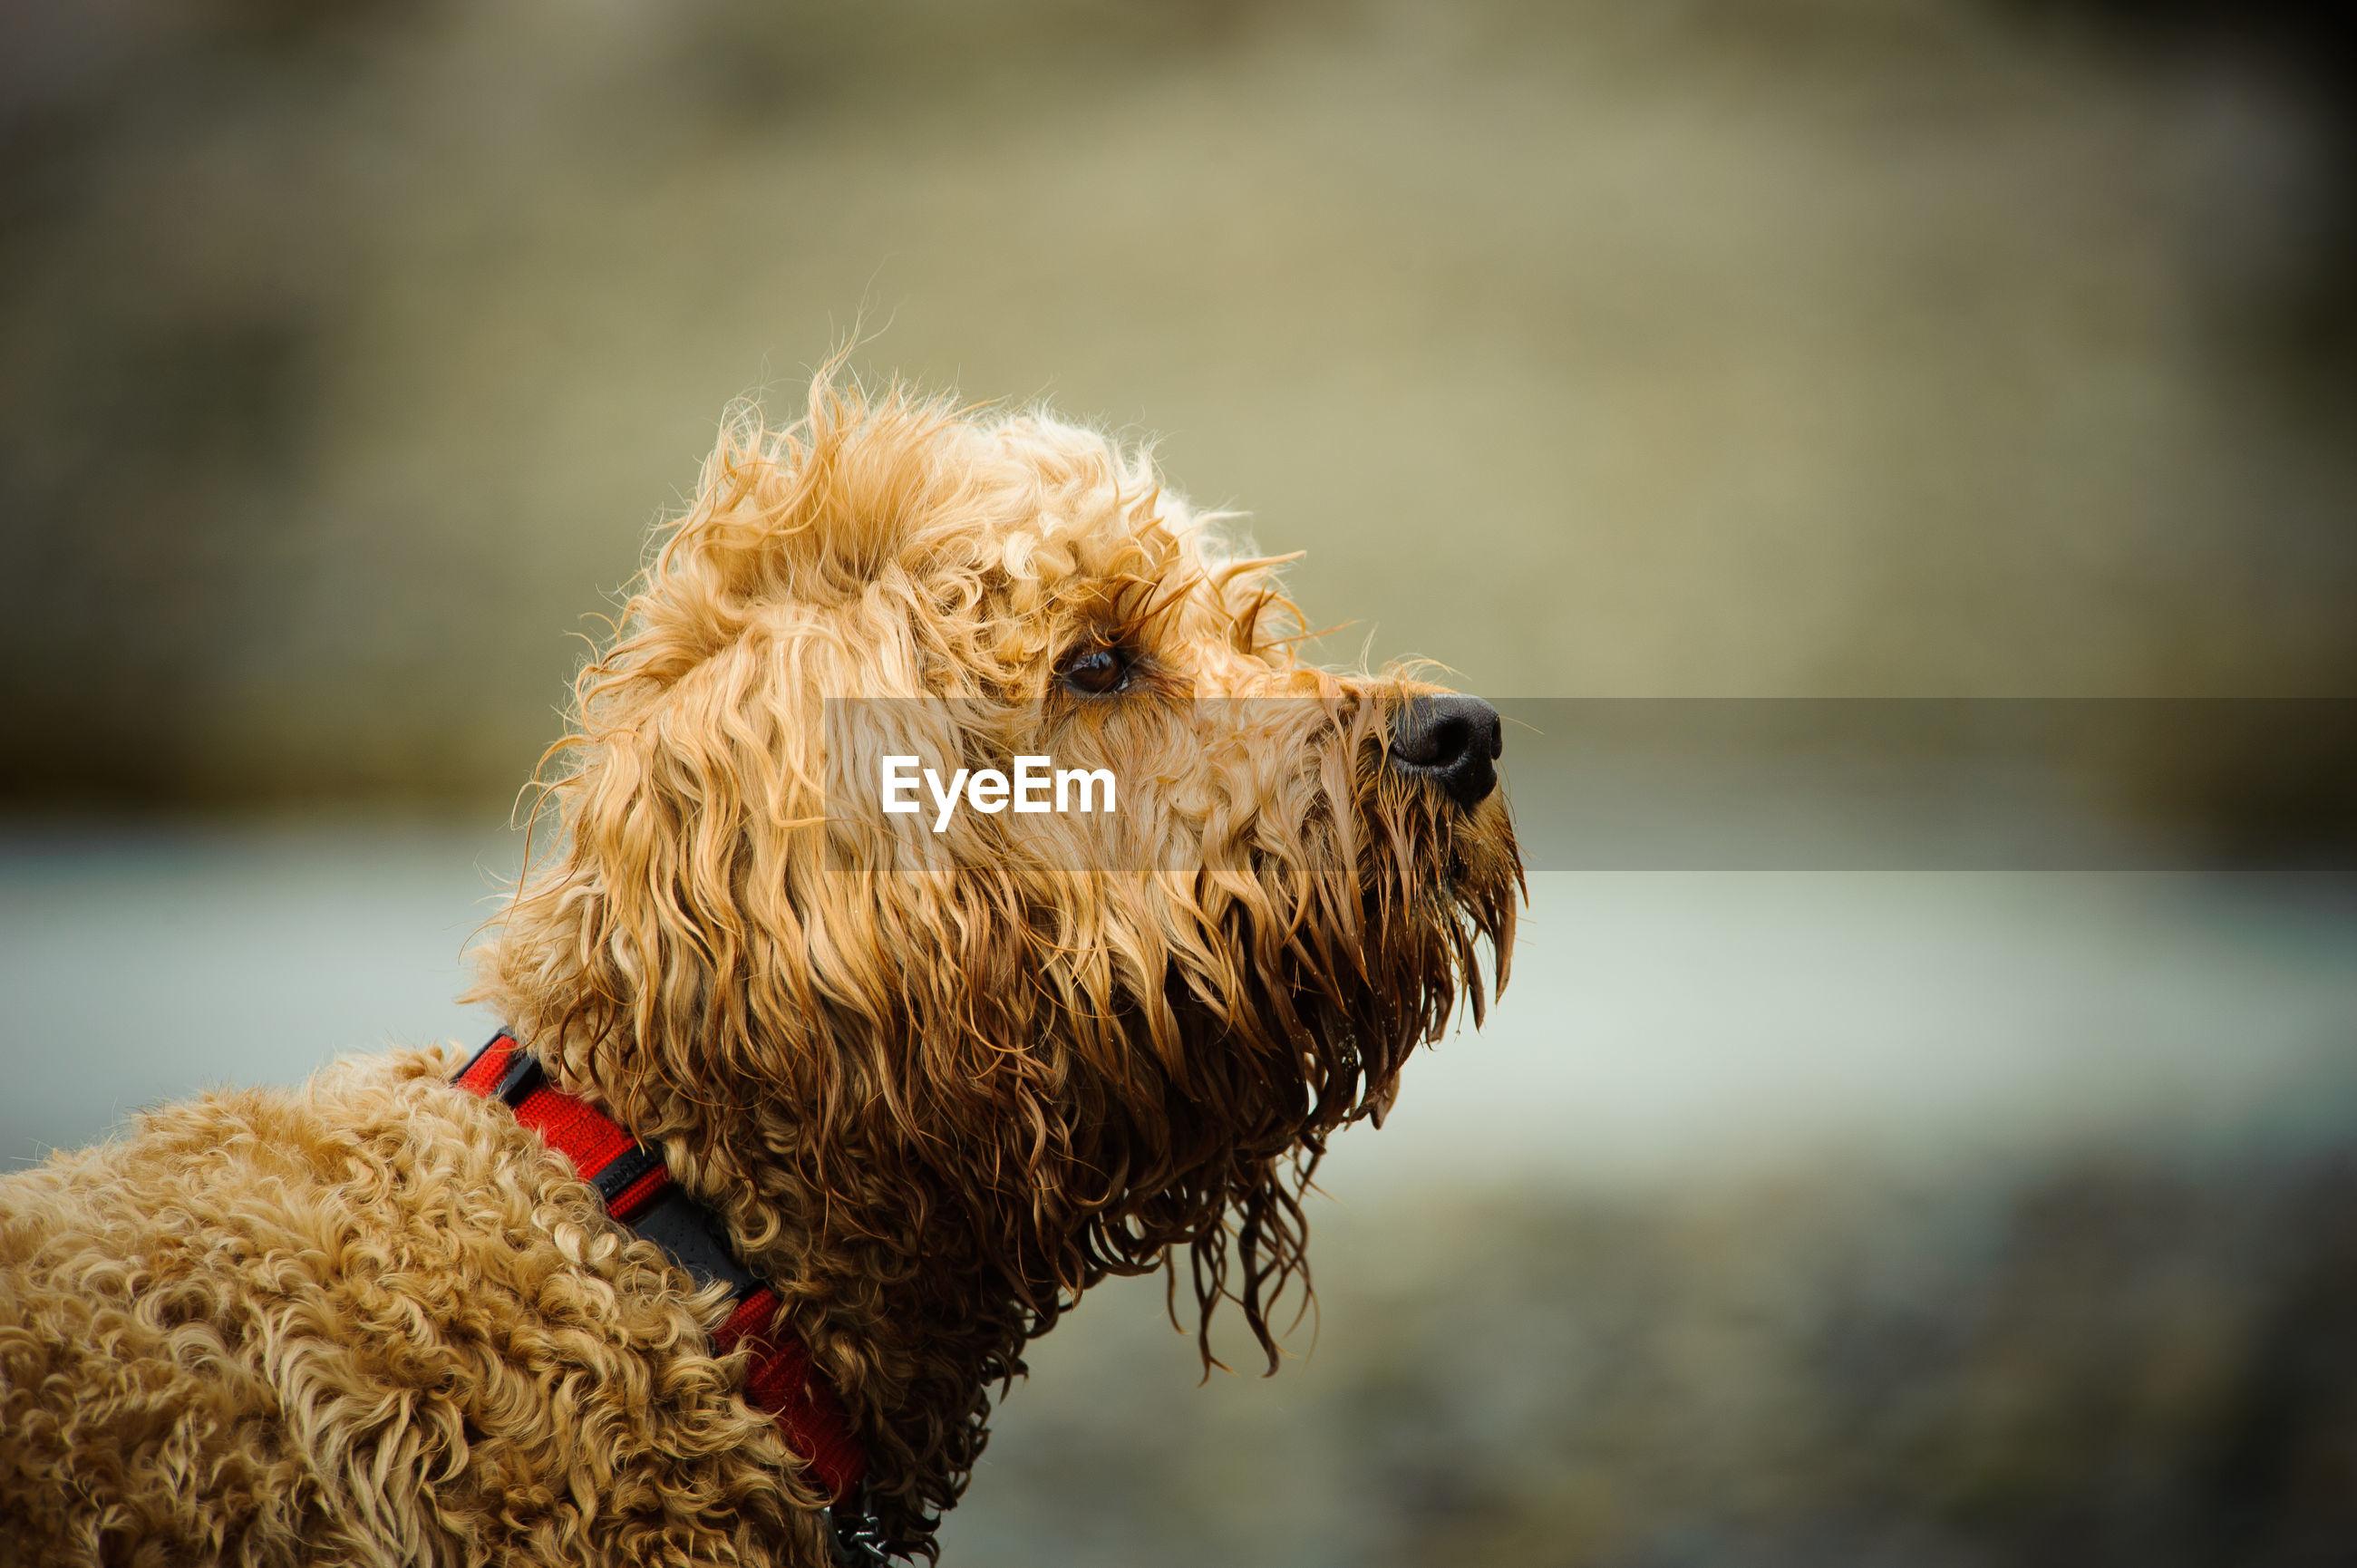 CLOSE-UP OF DOG ON STICK